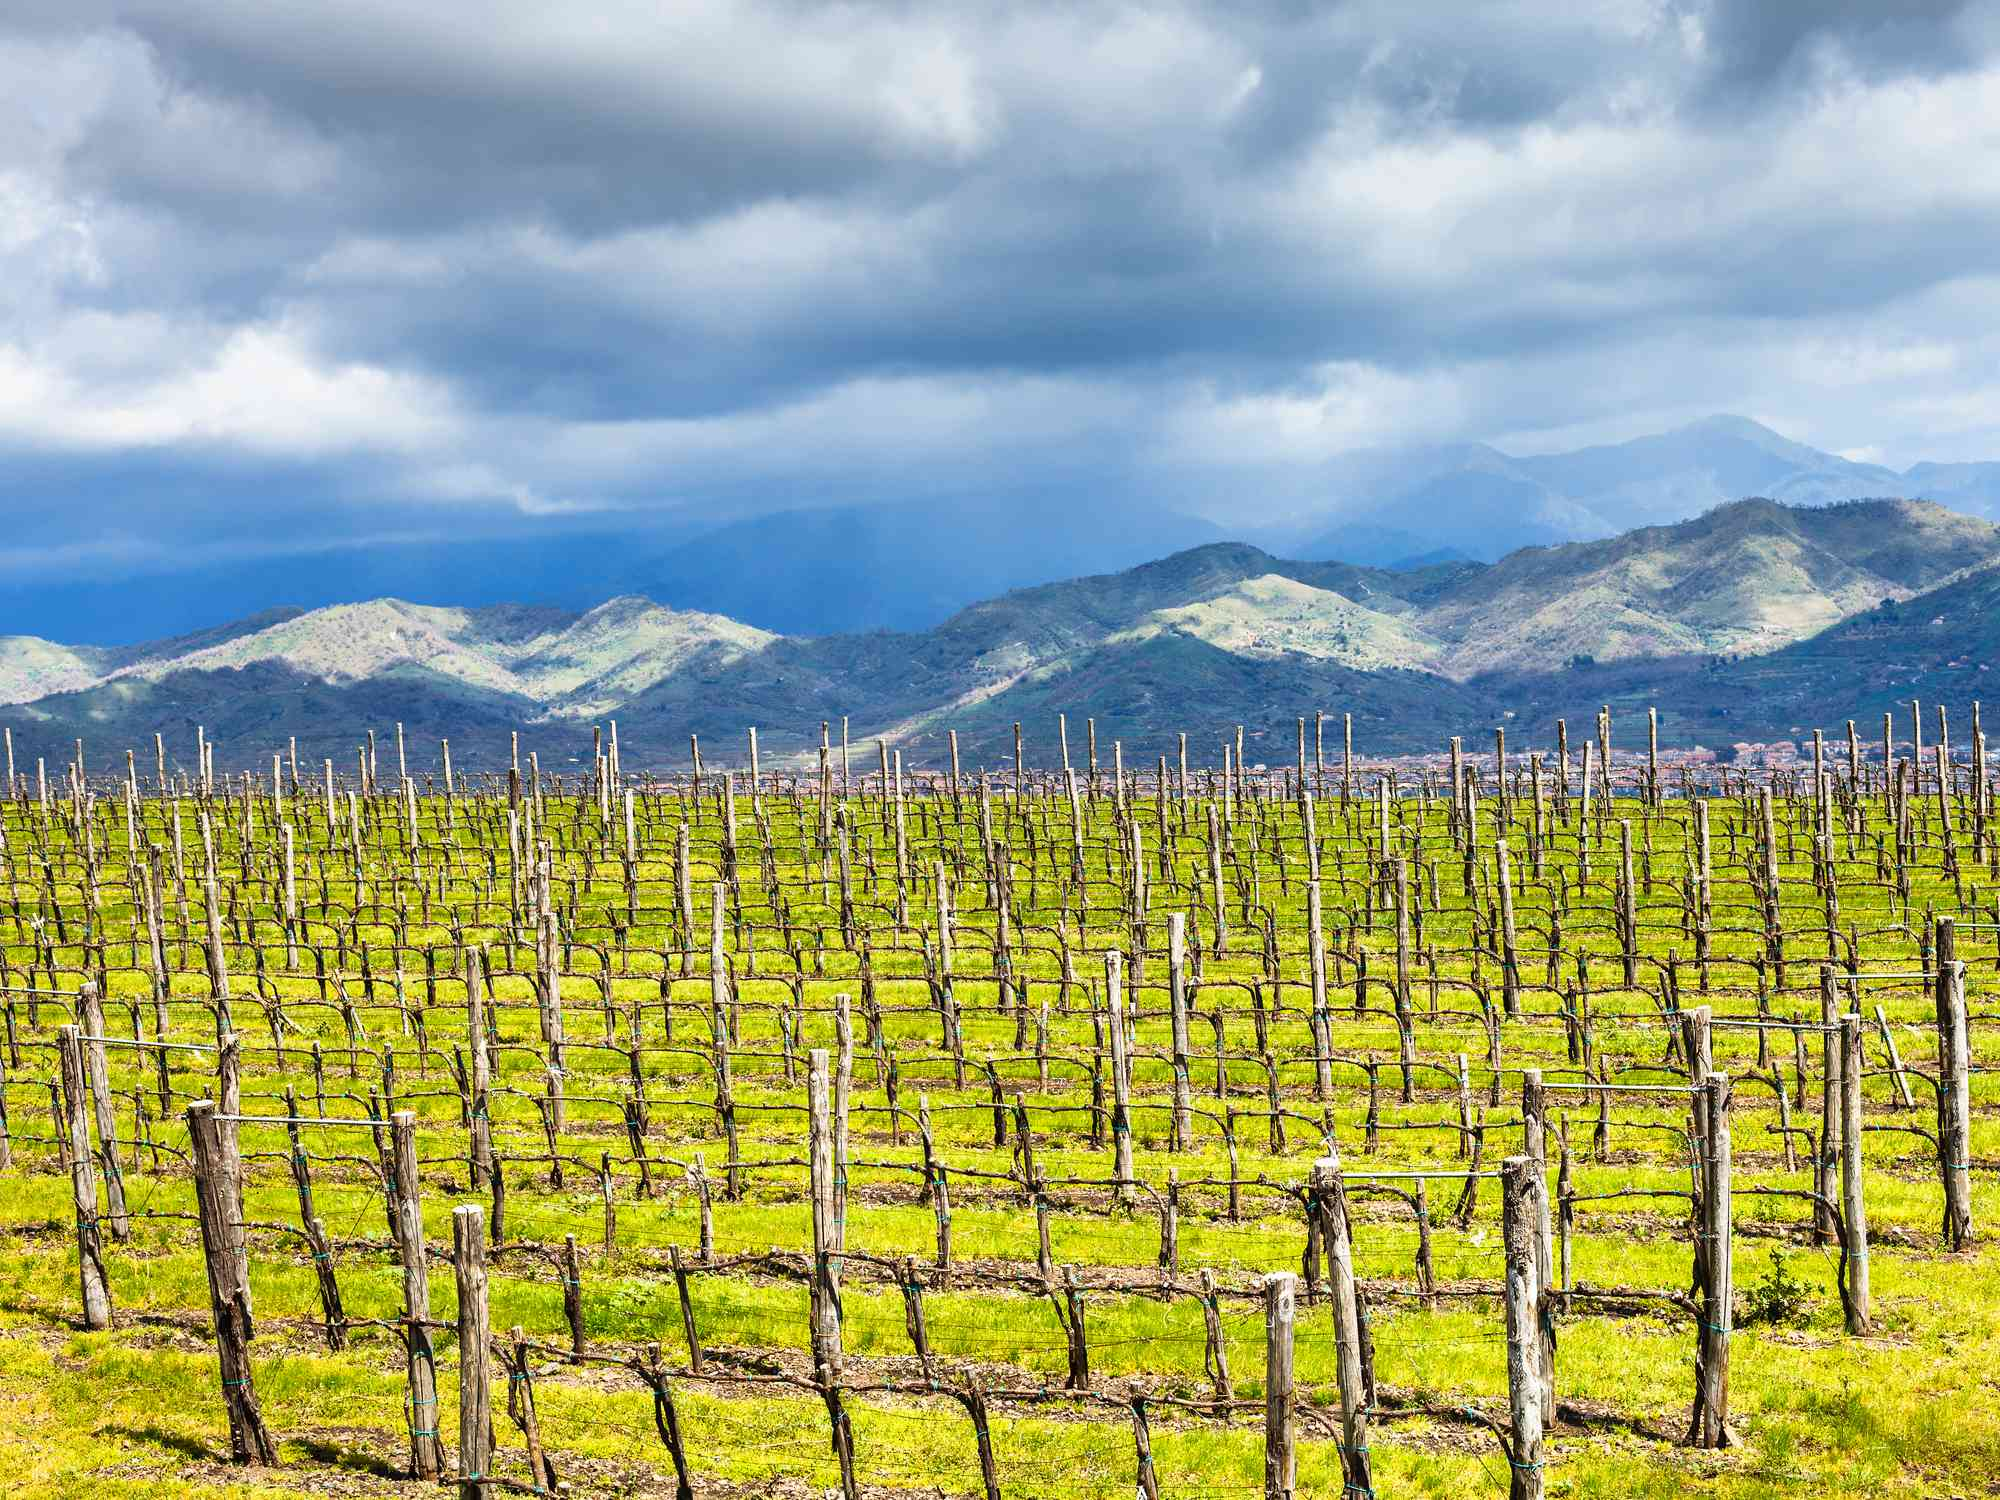 Springtime on Mt Etna with vines